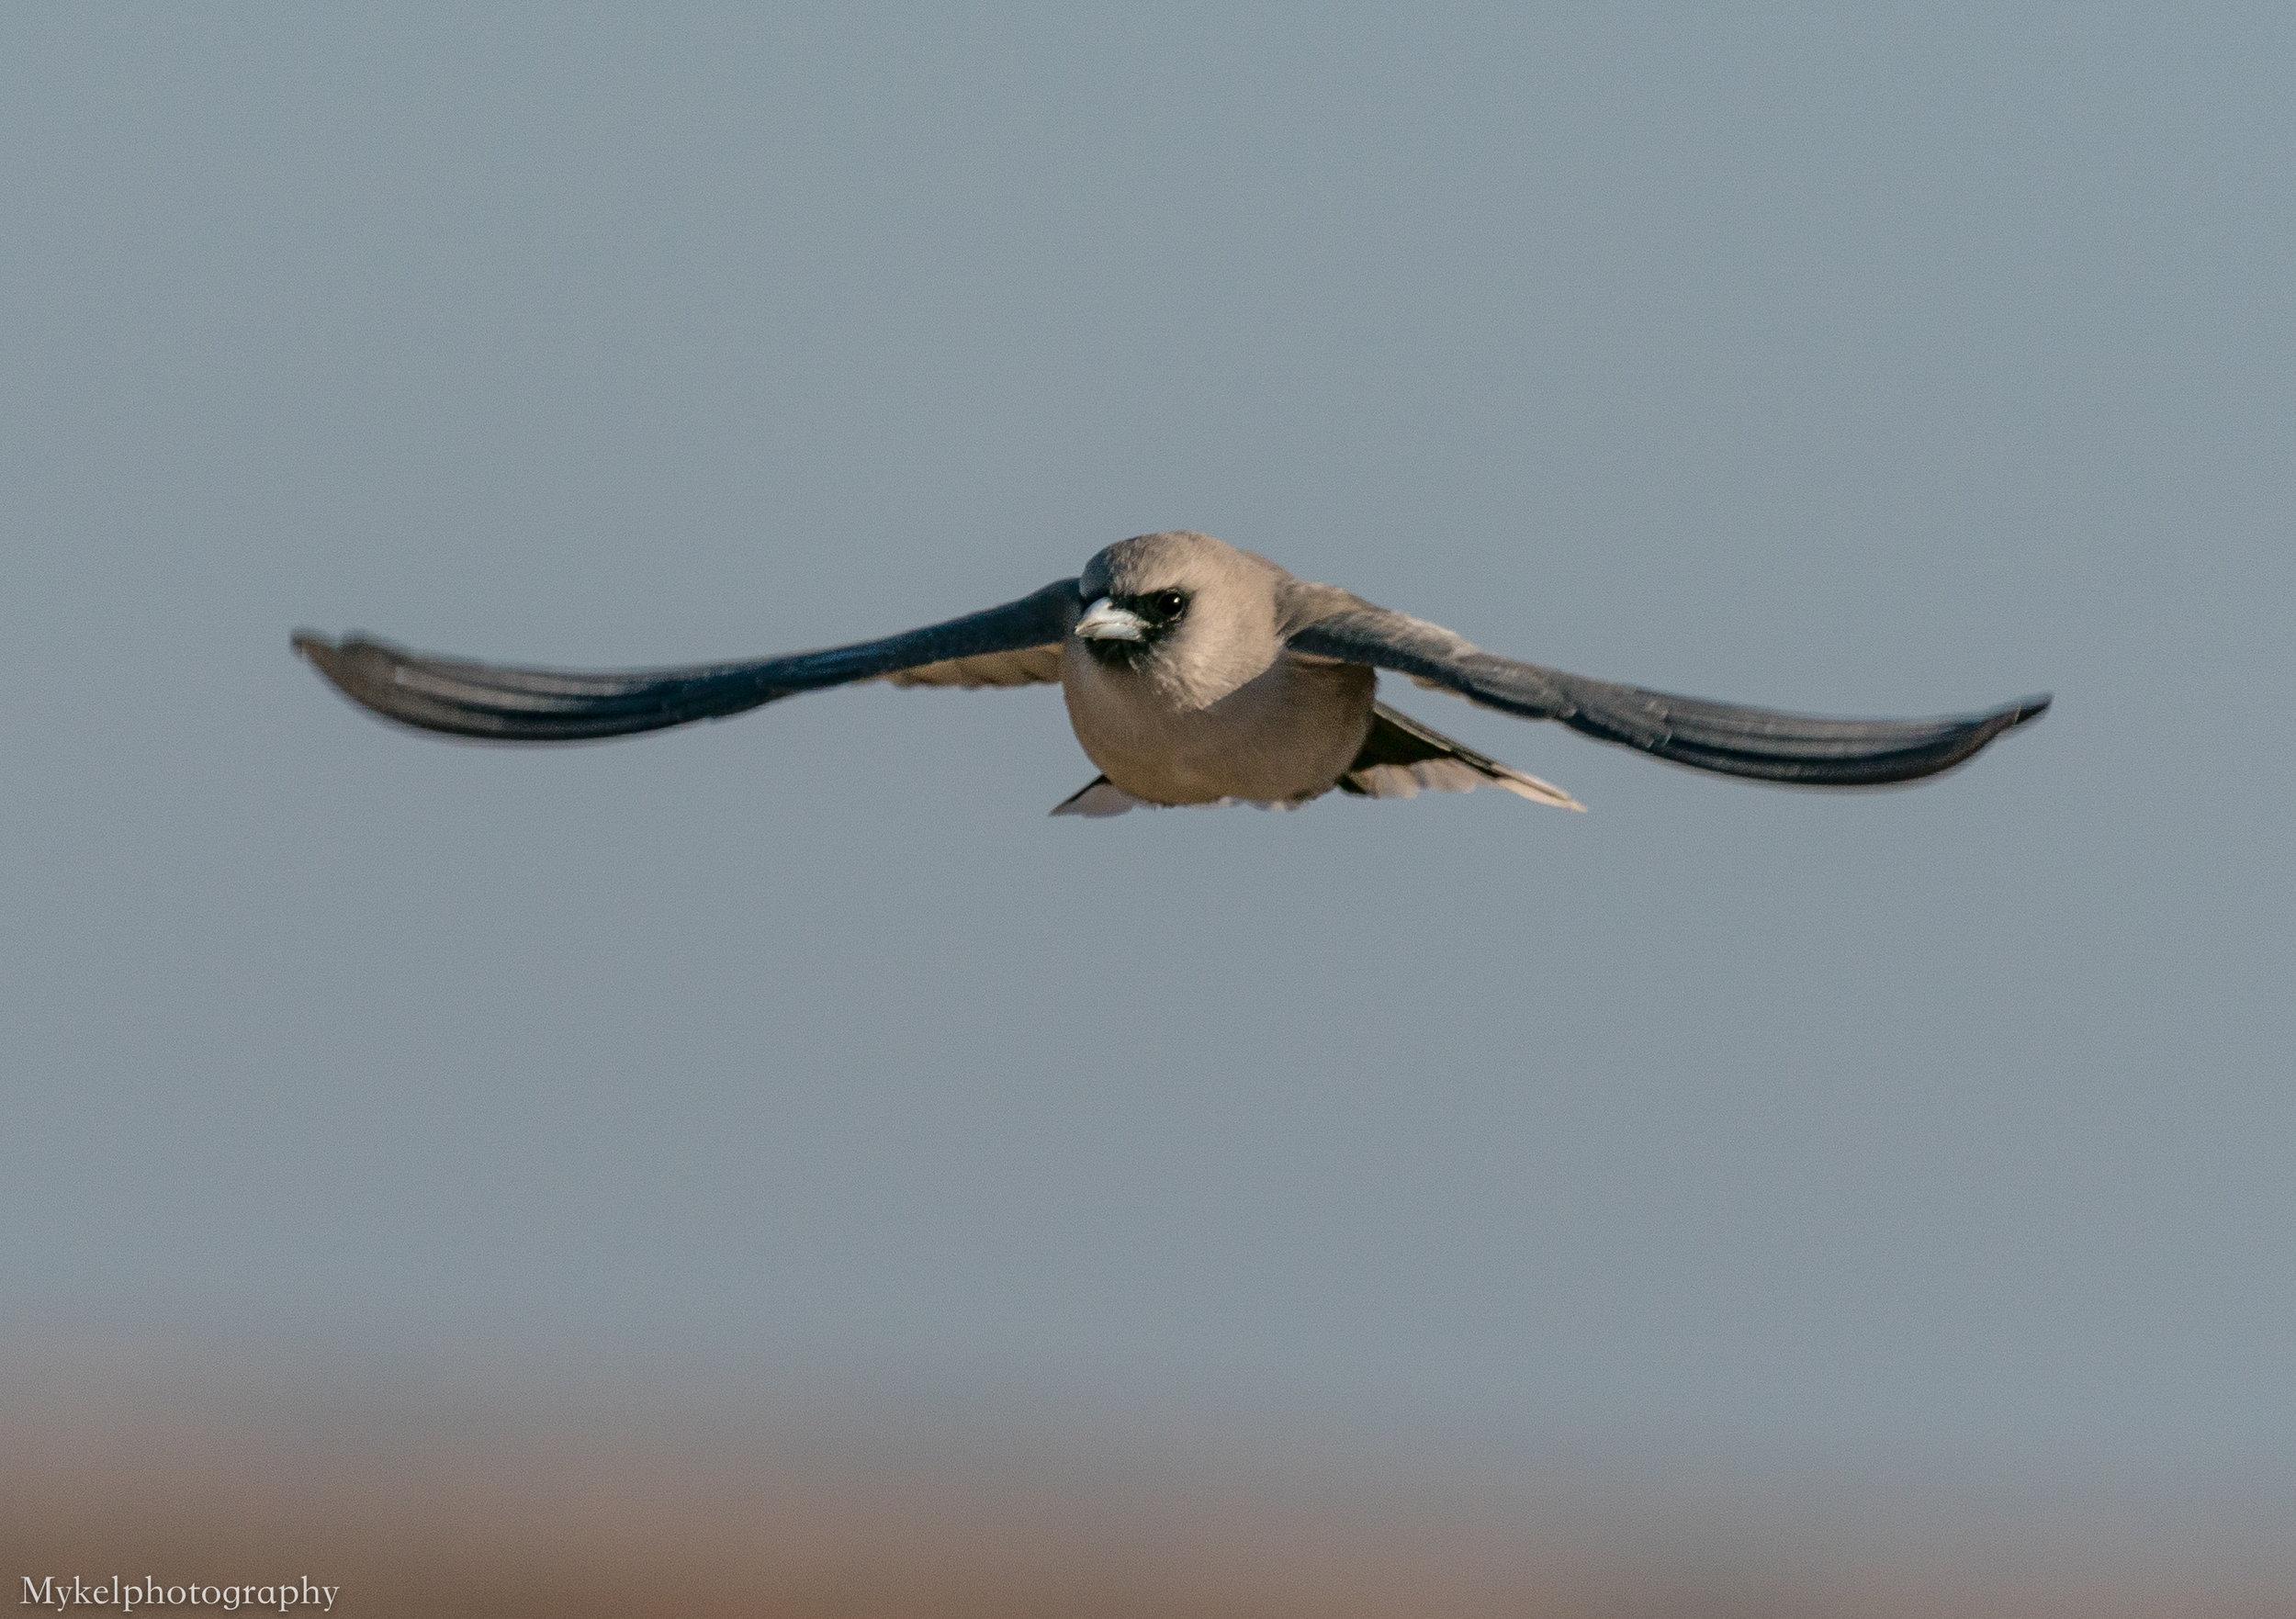 Black-faced Woodswallow, Artamus cinereus Artamidae